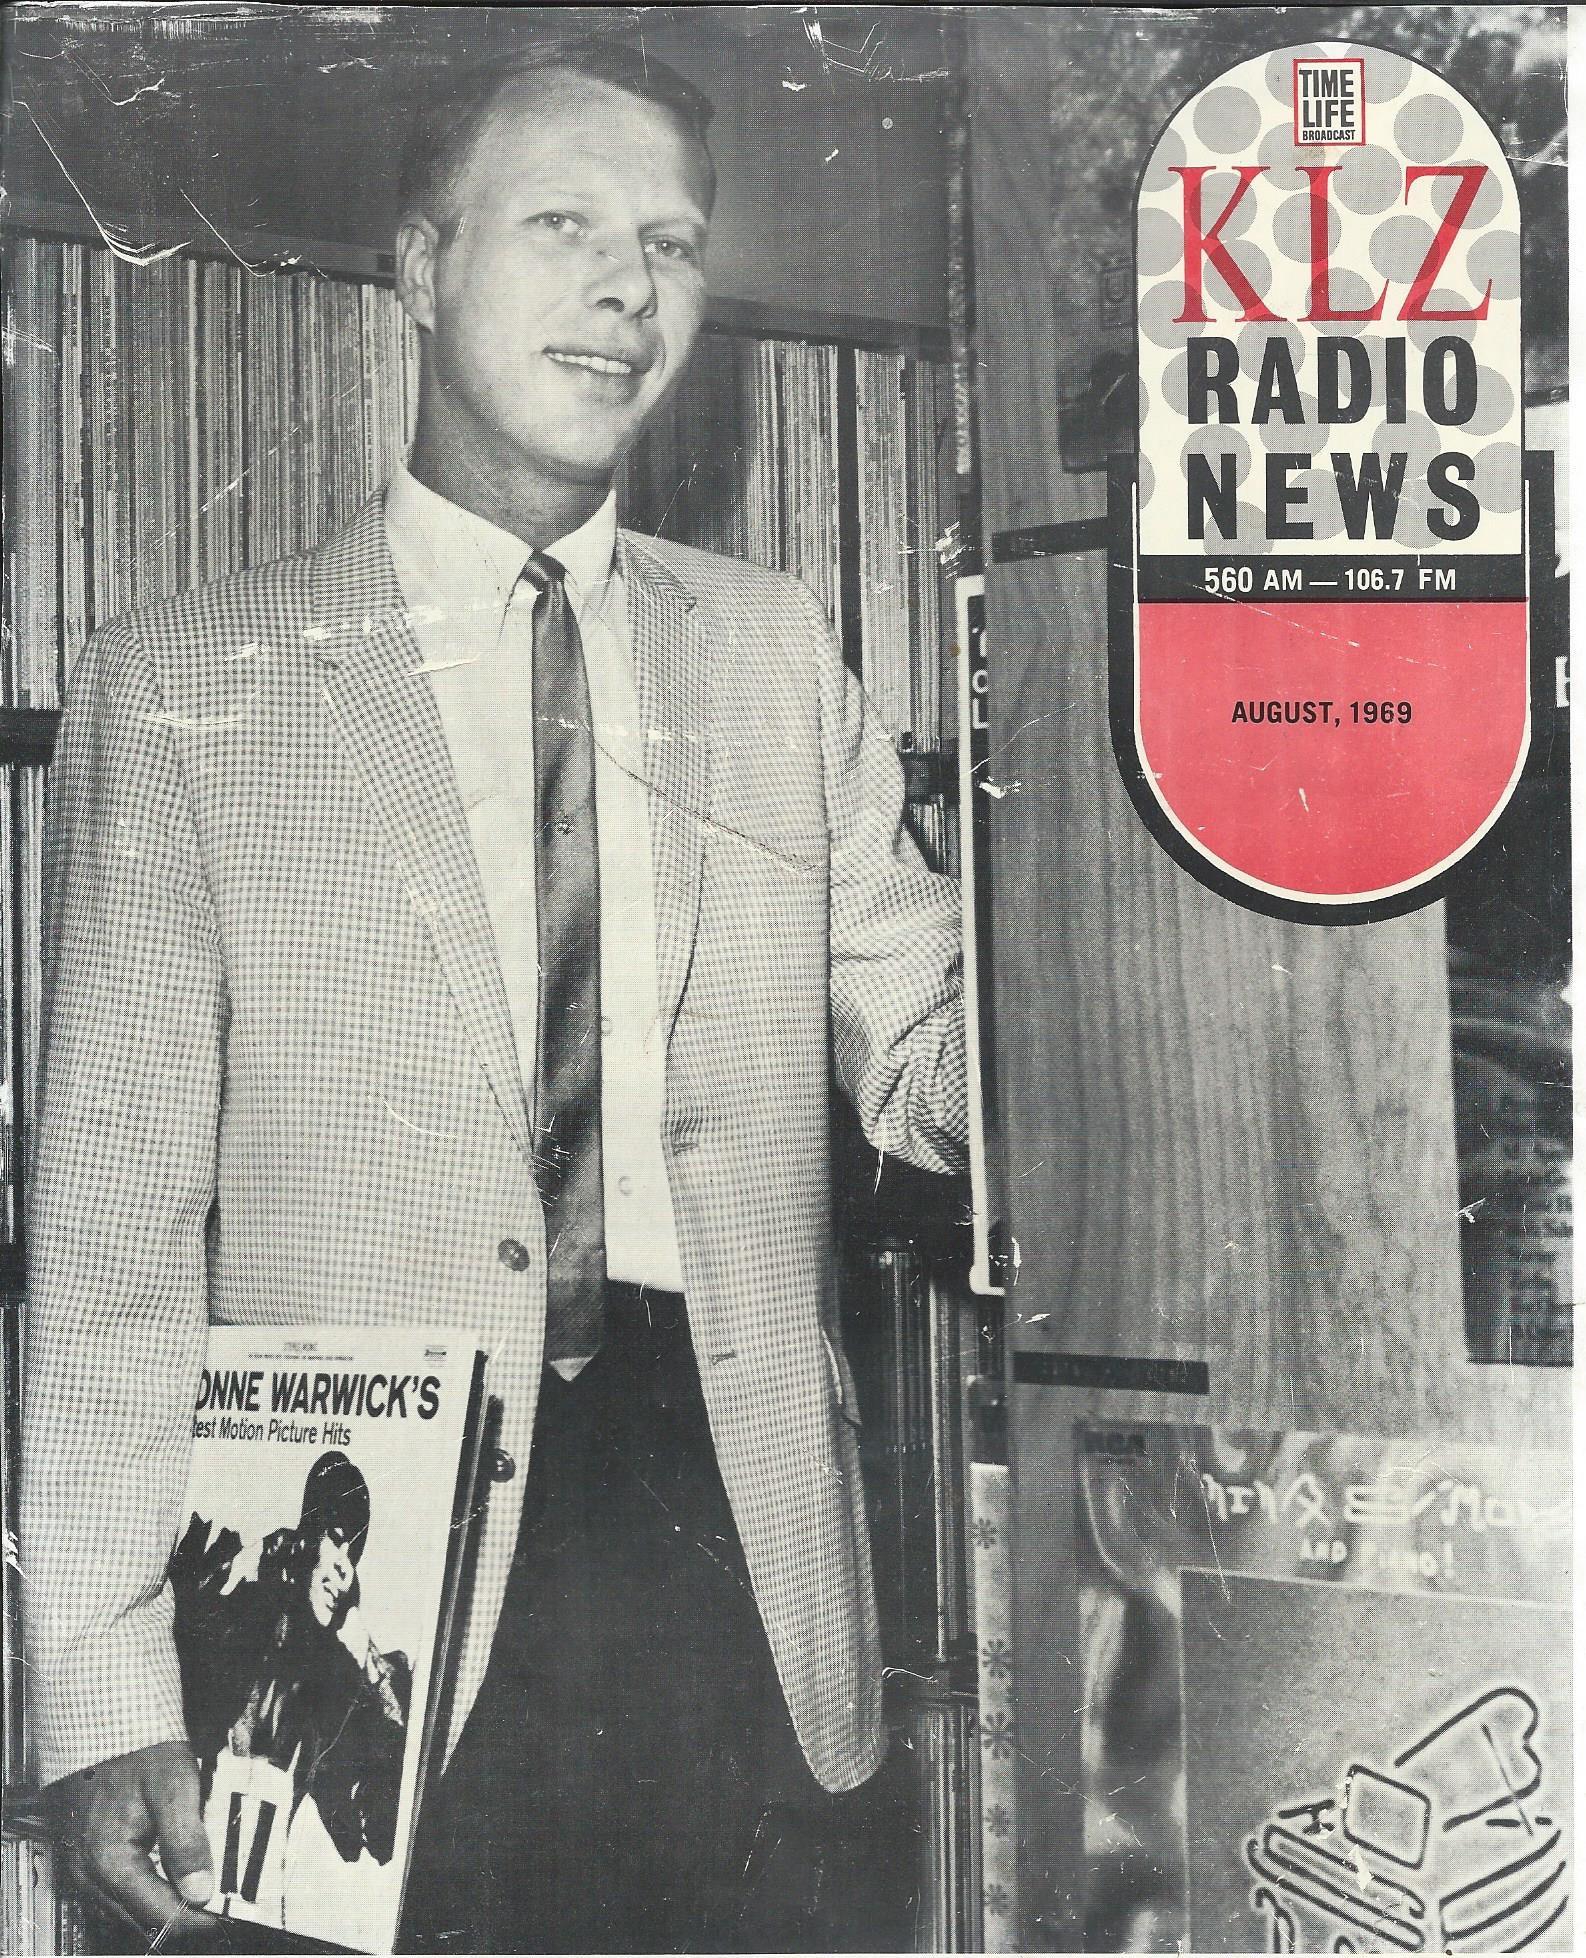 KLZ Radio News